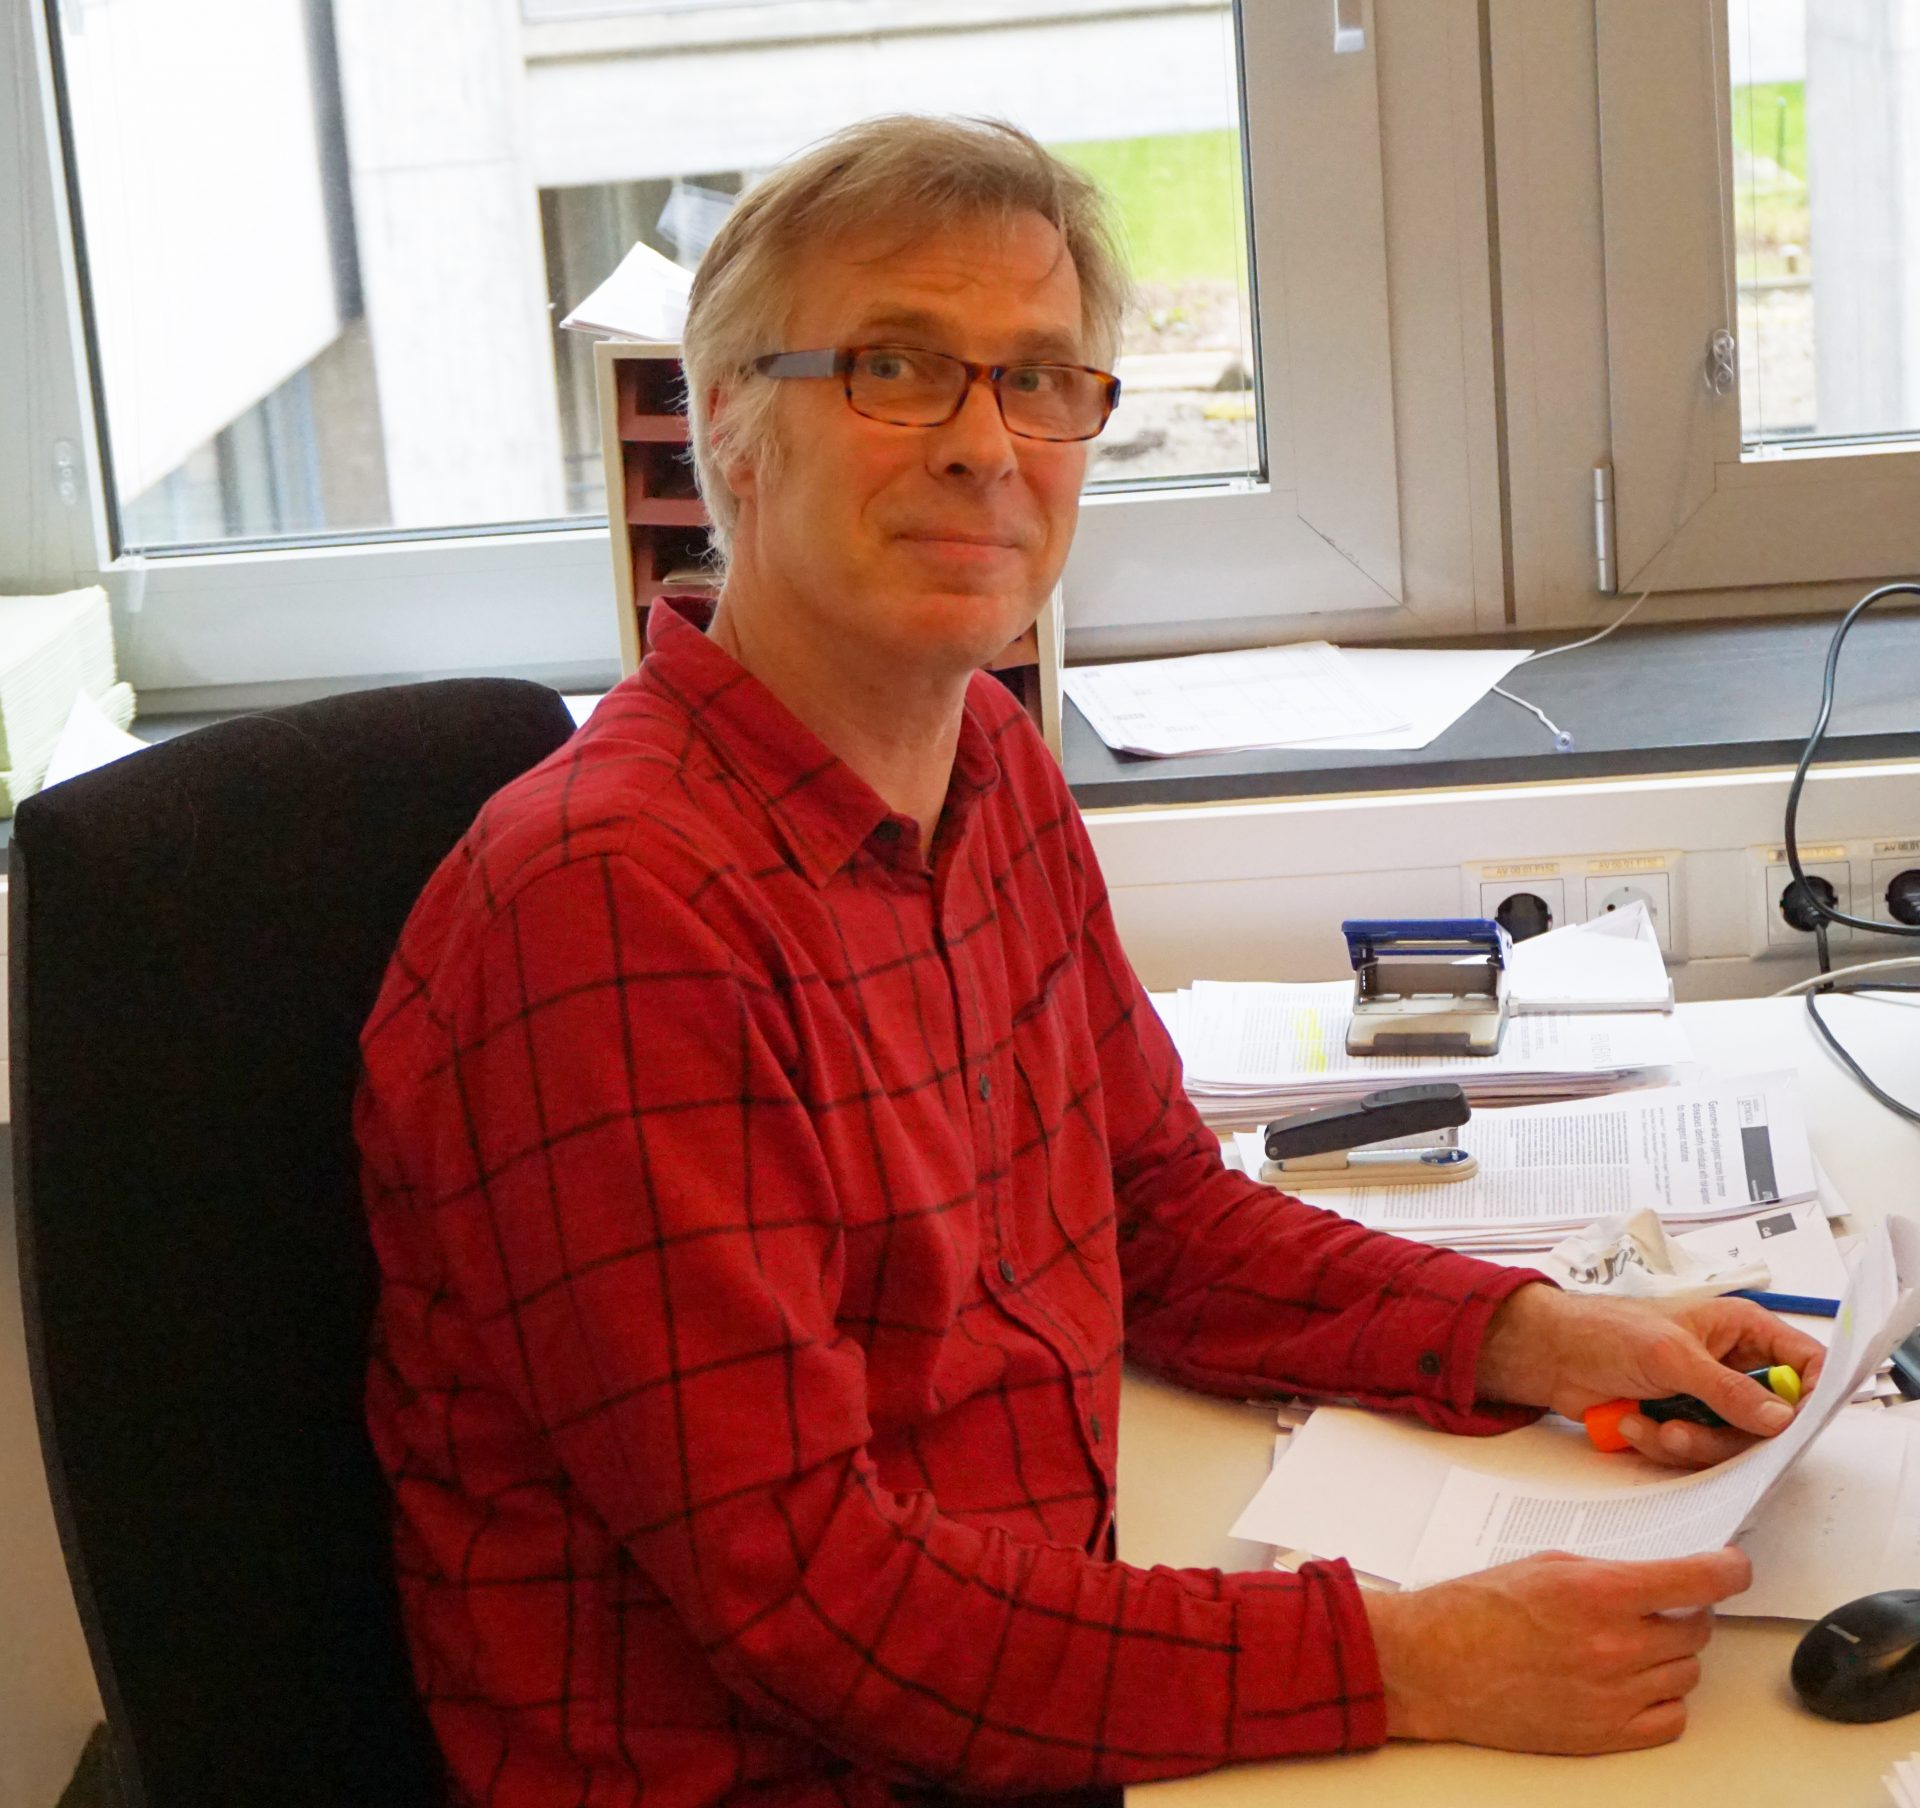 Dr. Lutz Hamann